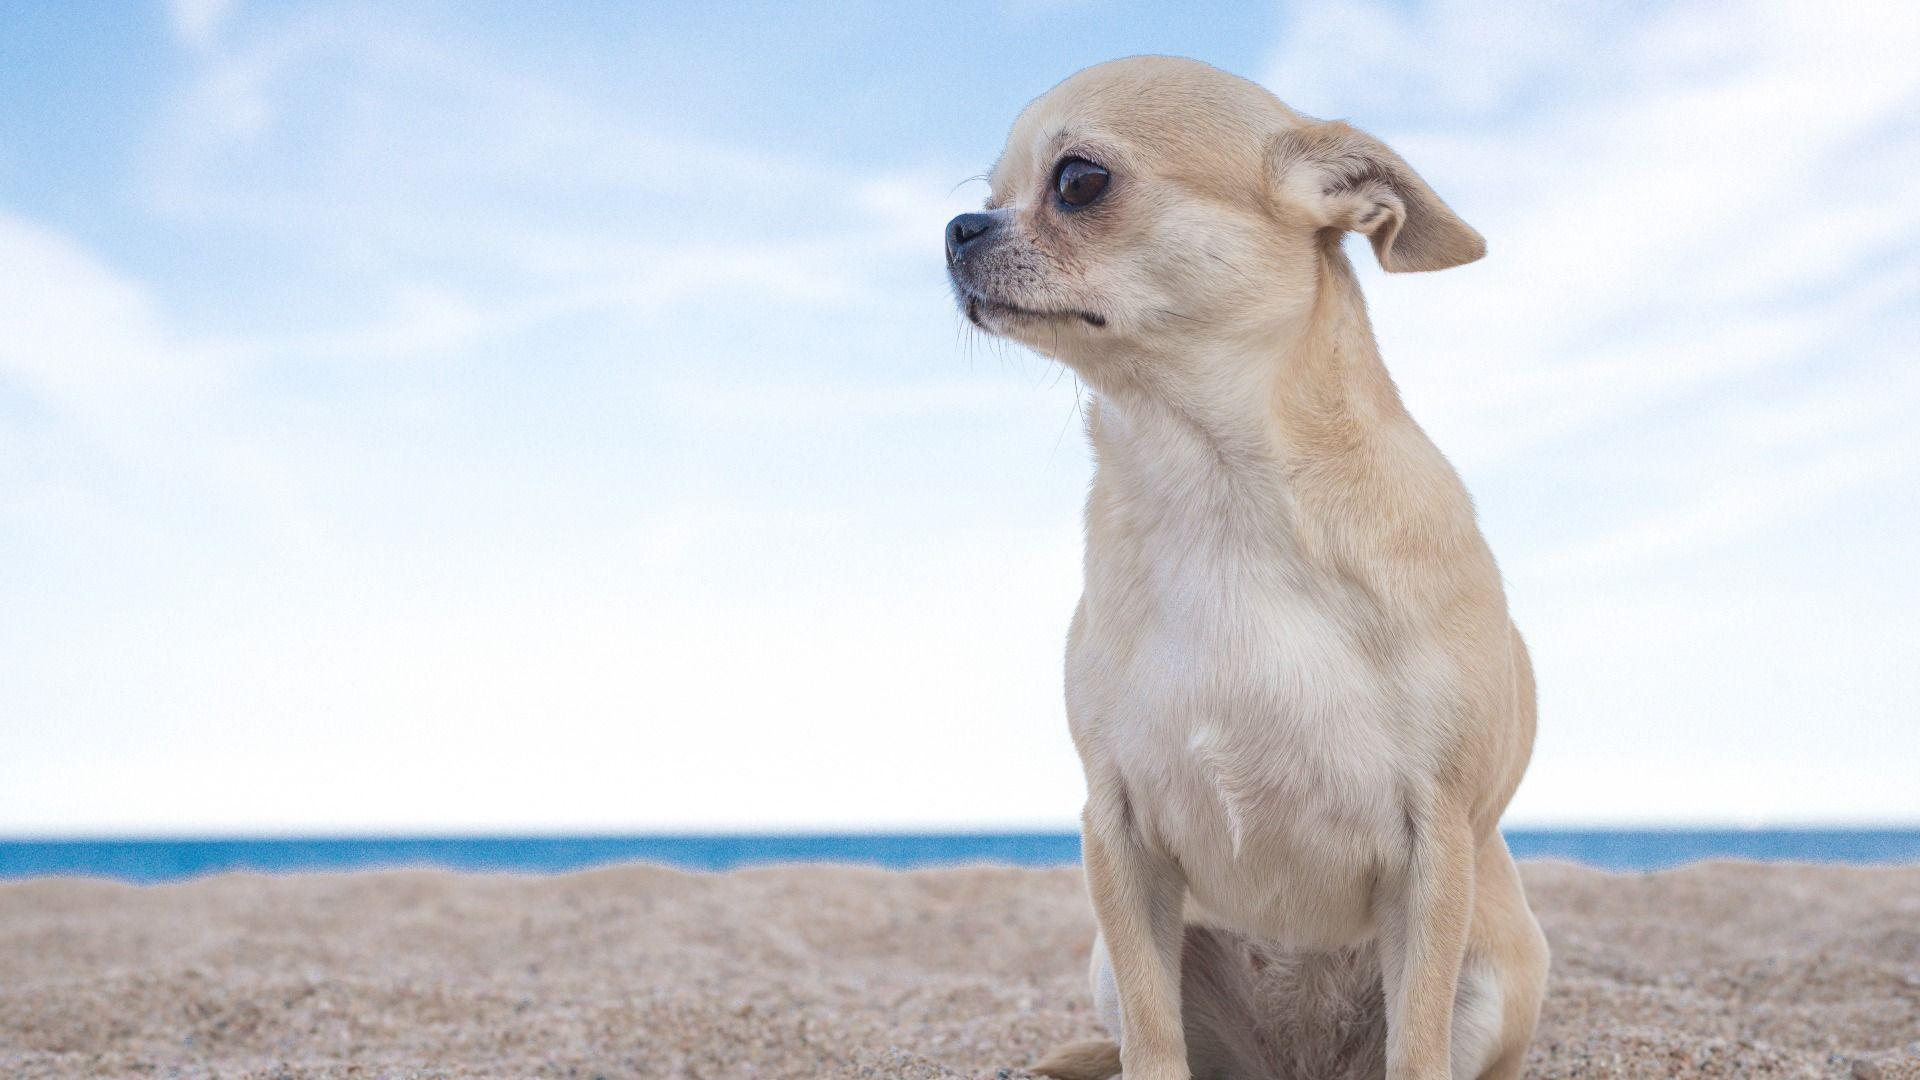 Chihuahua Dog Sea